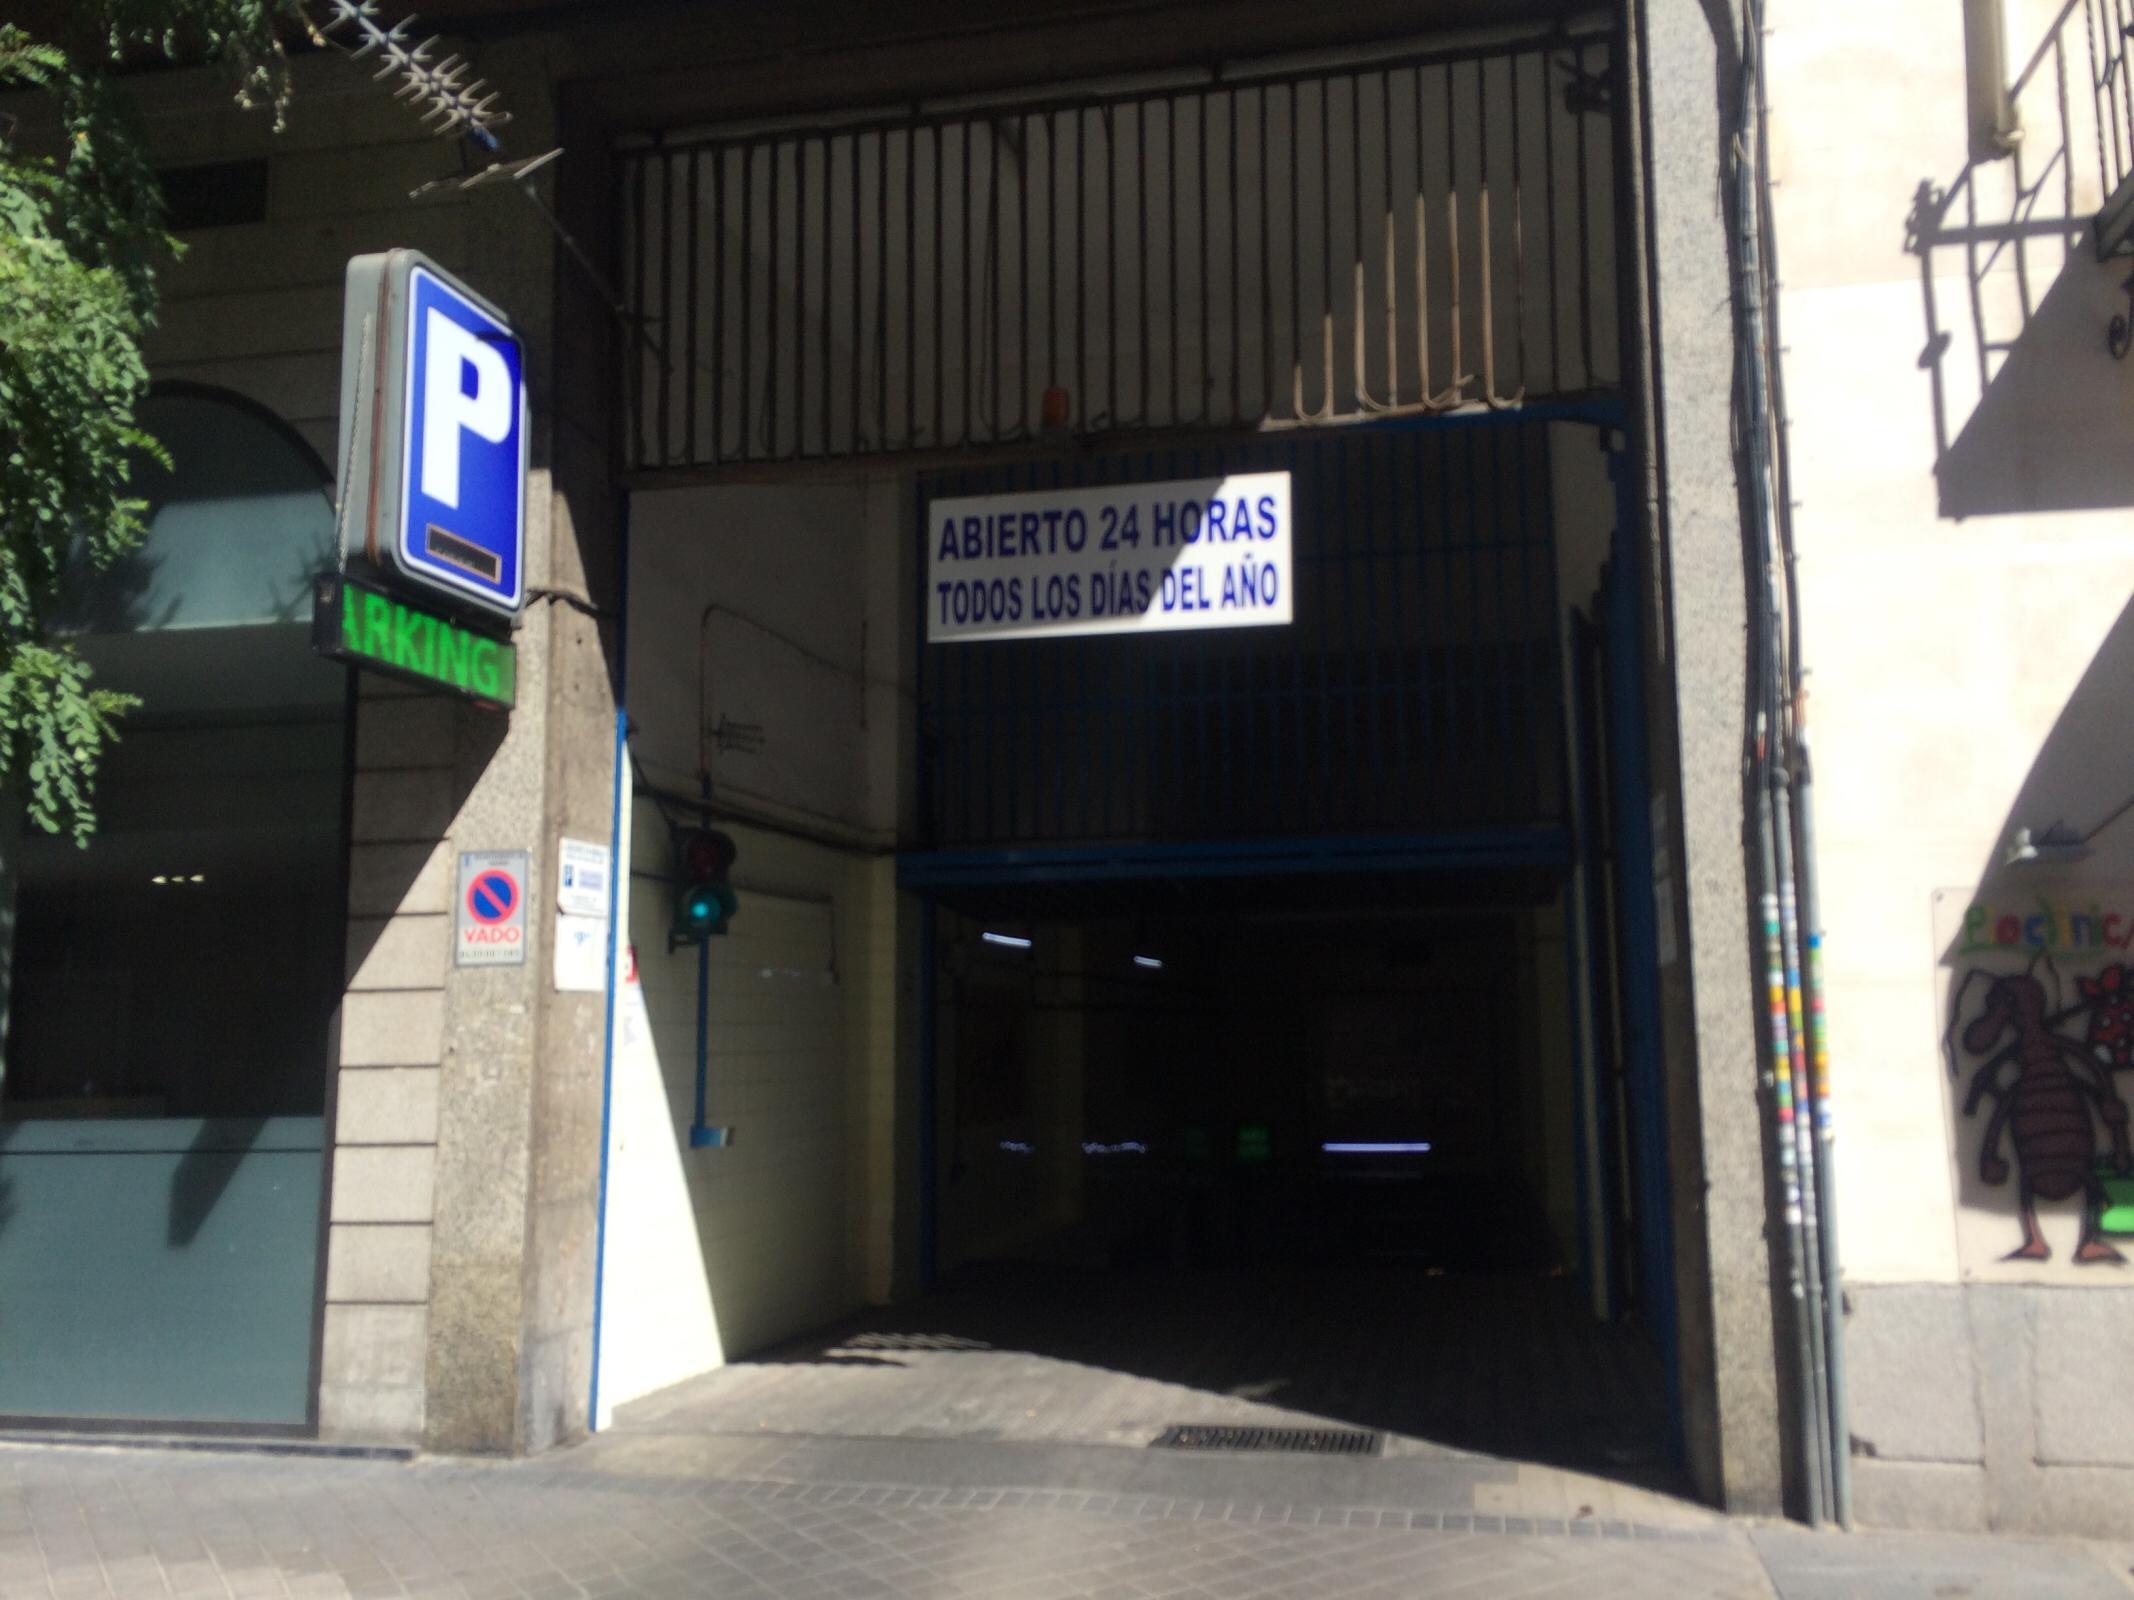 Calle de castell 96 garage parkeren in madrid parkme - Calle castello madrid ...